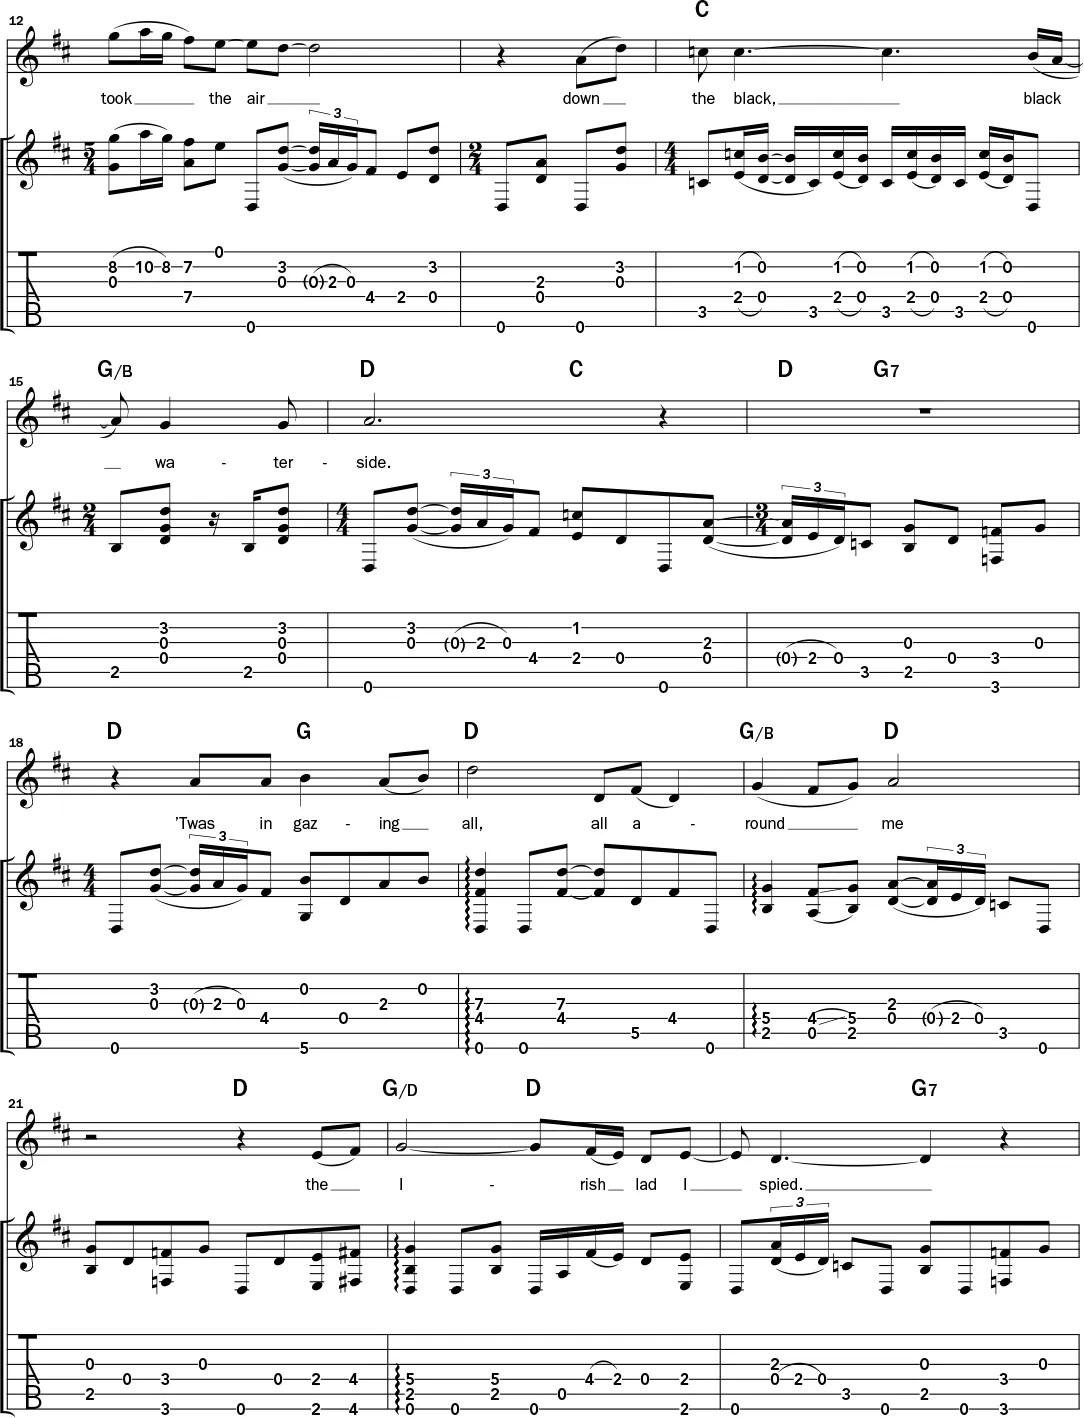 Acoustic Classic Play Bert Jansch S Arrangement Of The Trad Tune